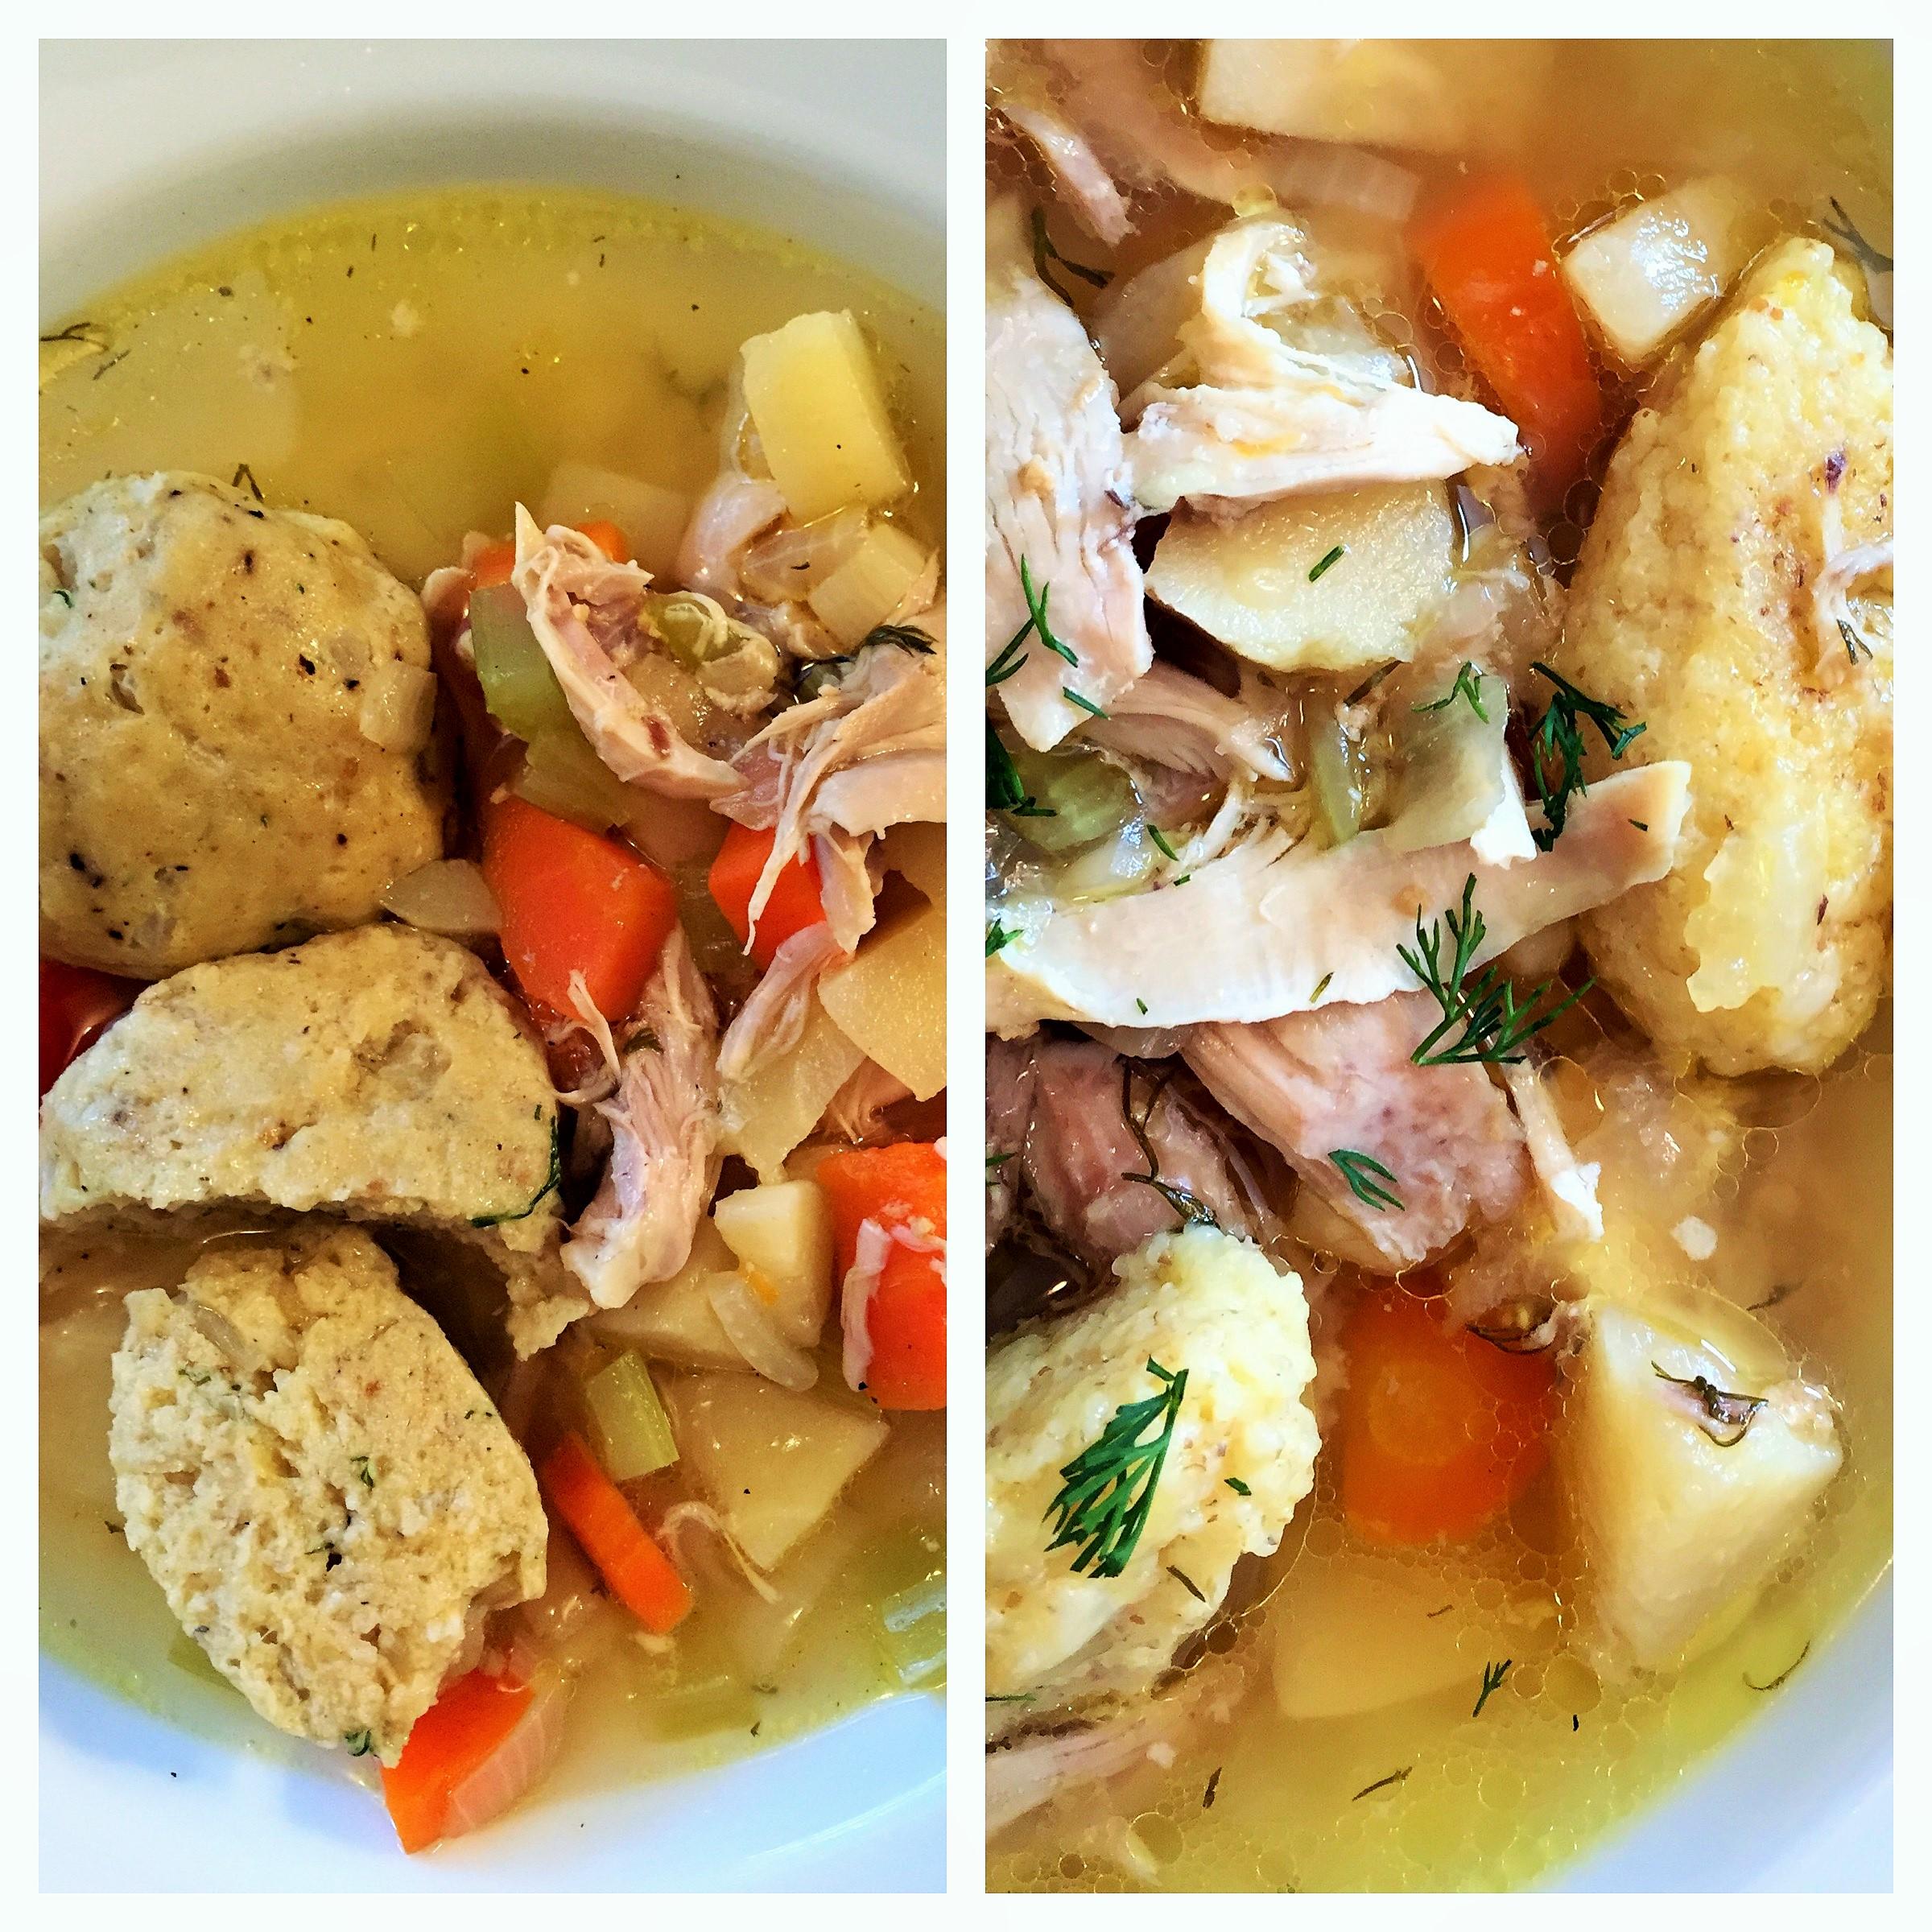 Soup with Matzo Balls, or Cream of Wheat Dumplings